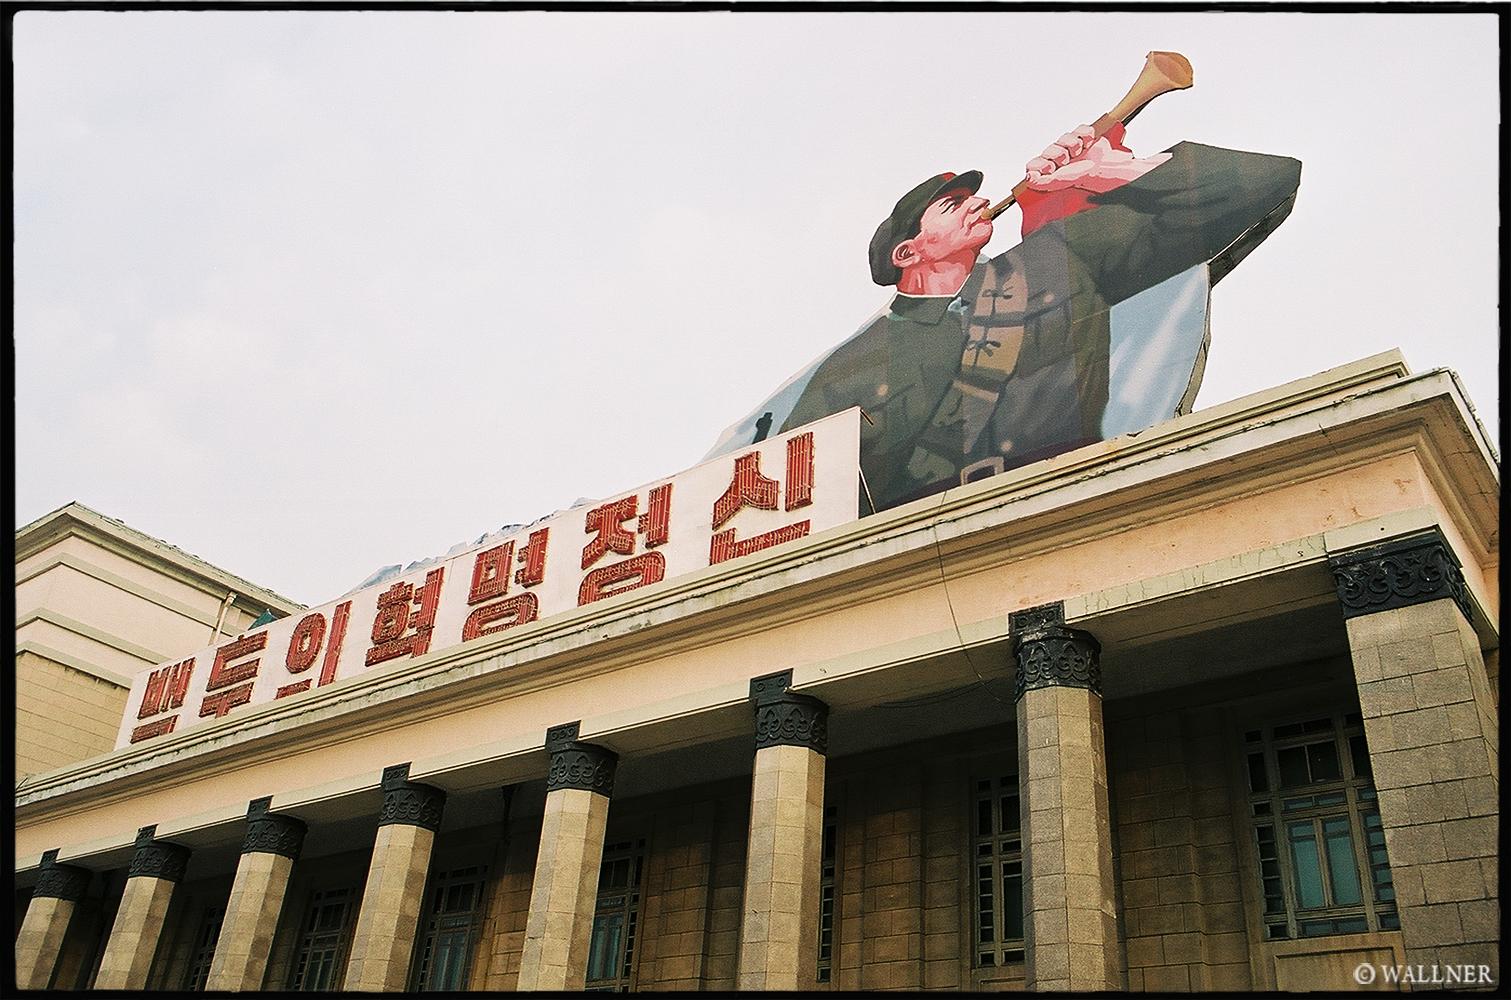 35mmPatrikWallner_Pyongyang_TrumpetLOWQ